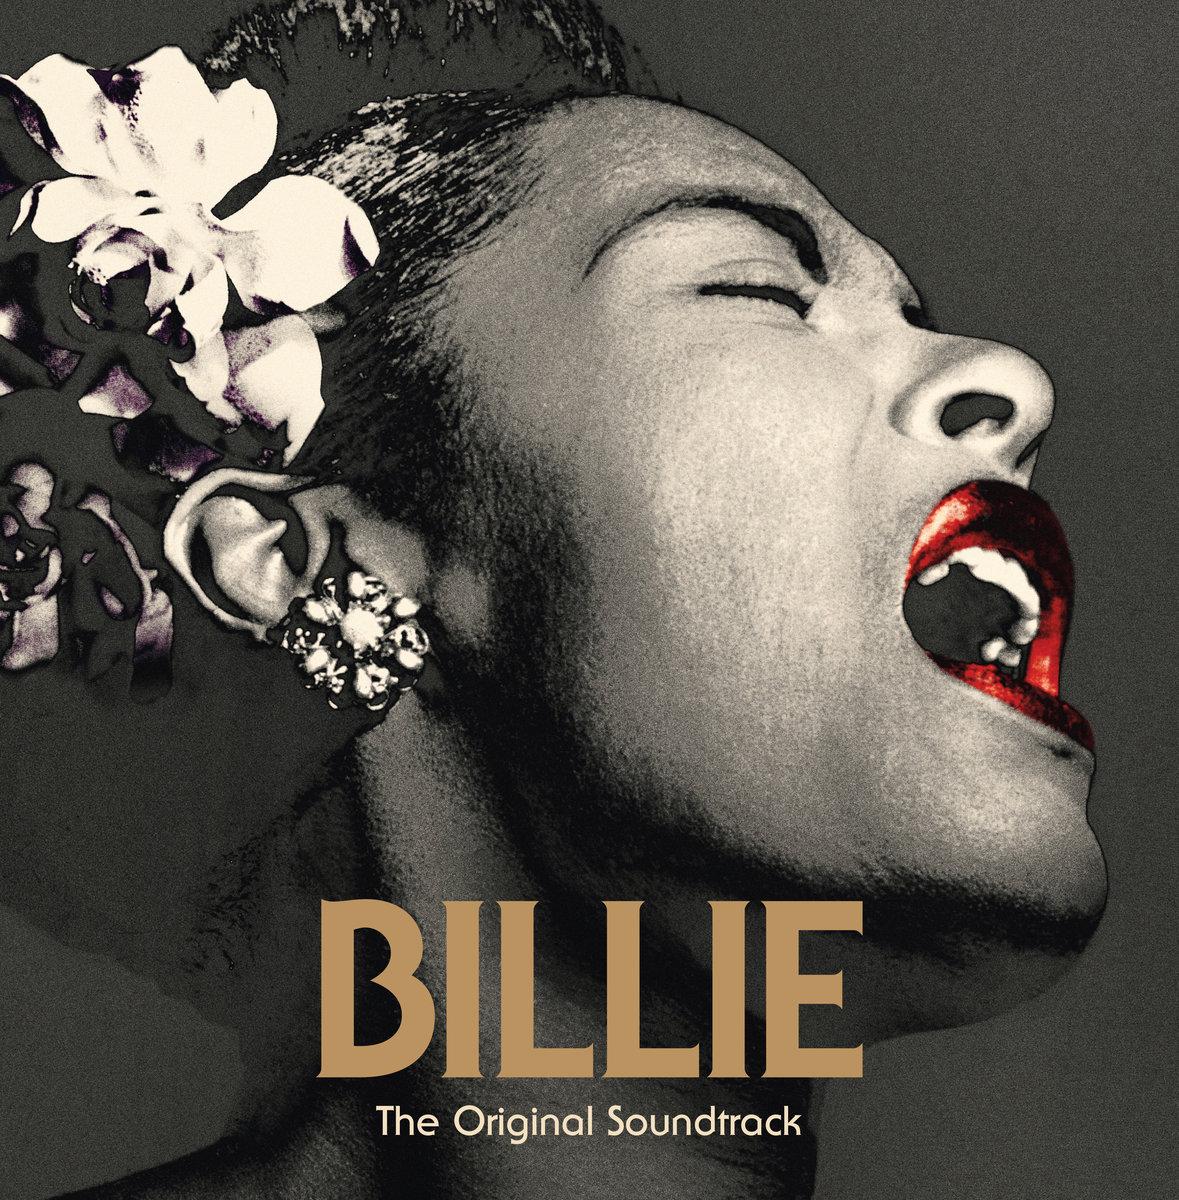 Billie. The Original Soundtrack